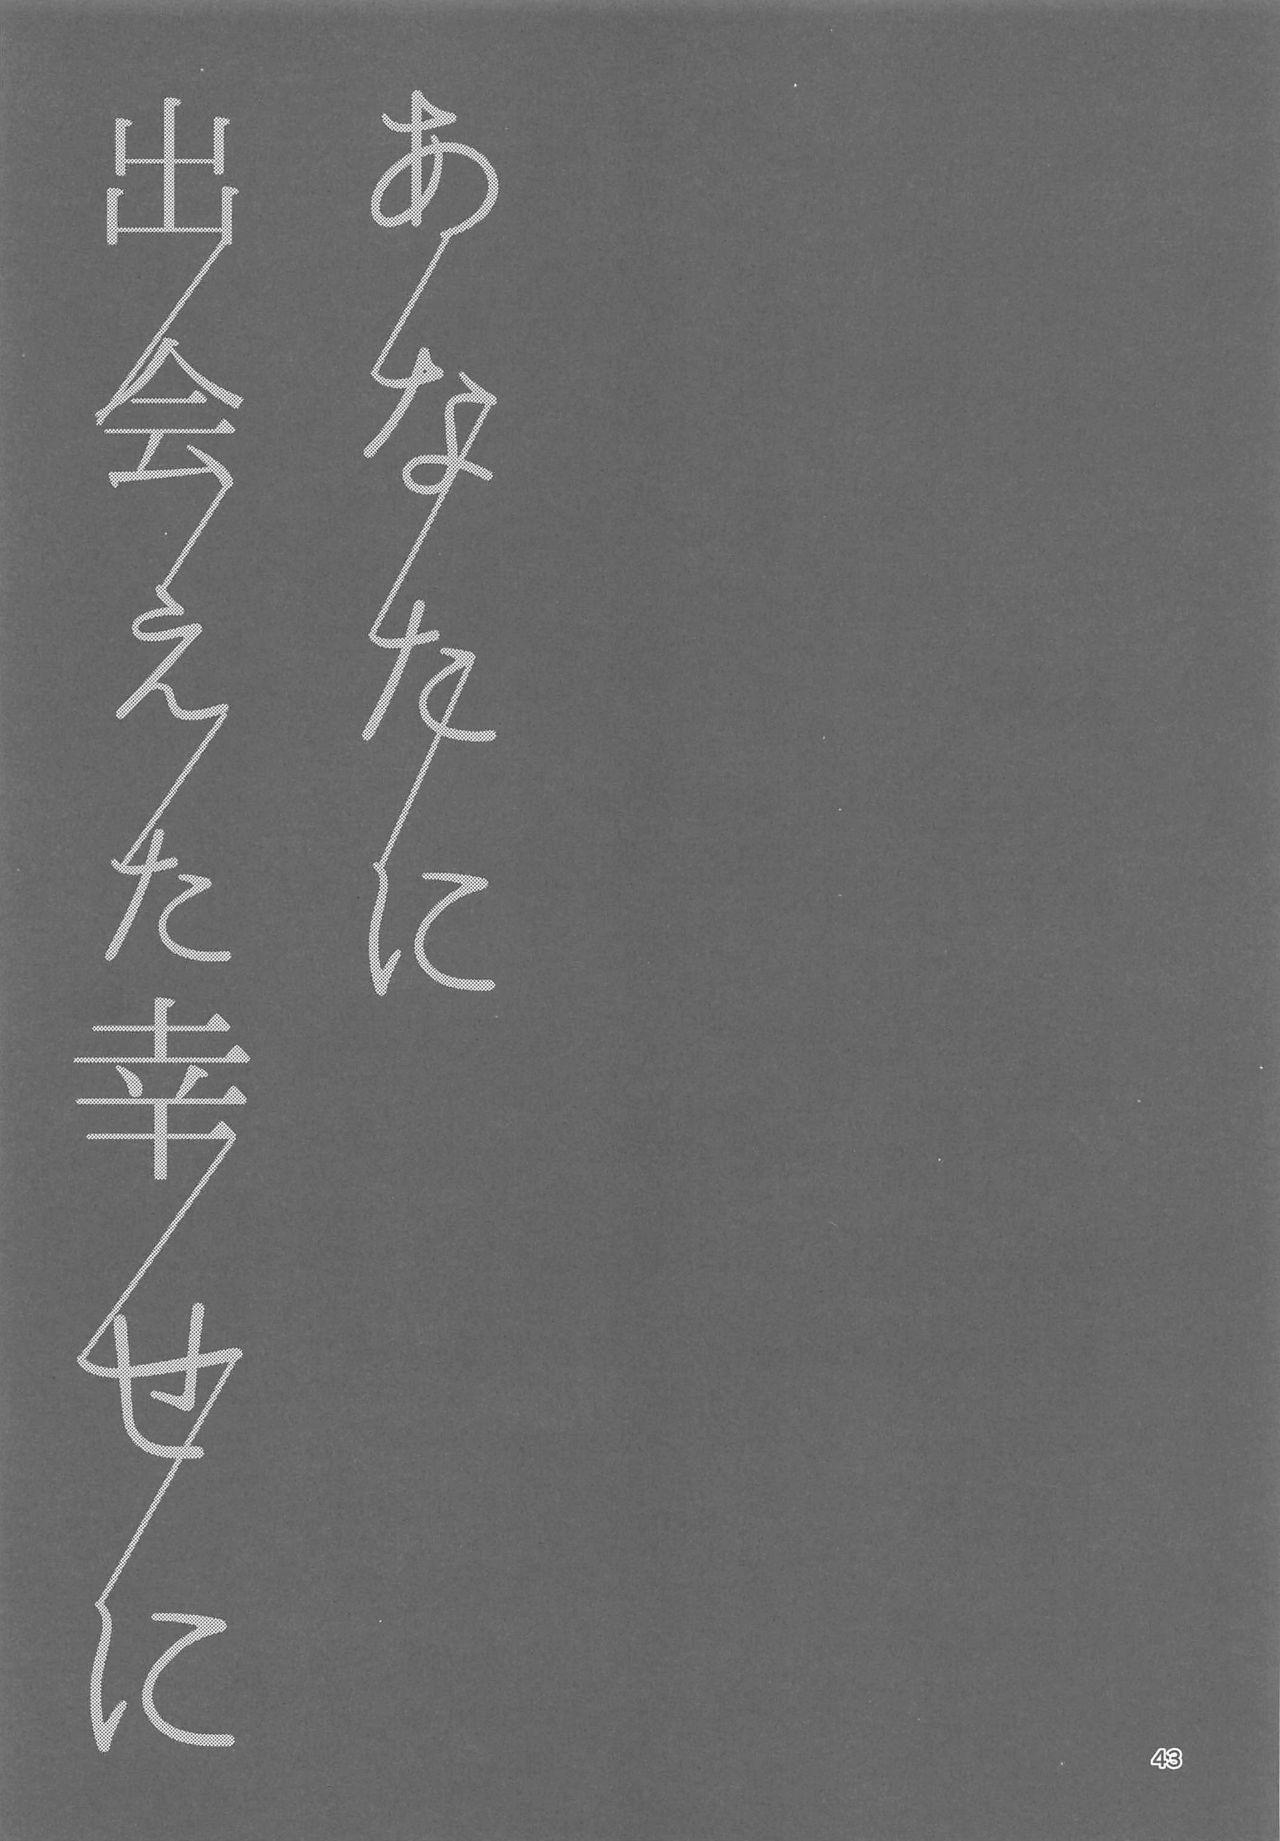 Anata ni Deaeta Shiawase ni 42